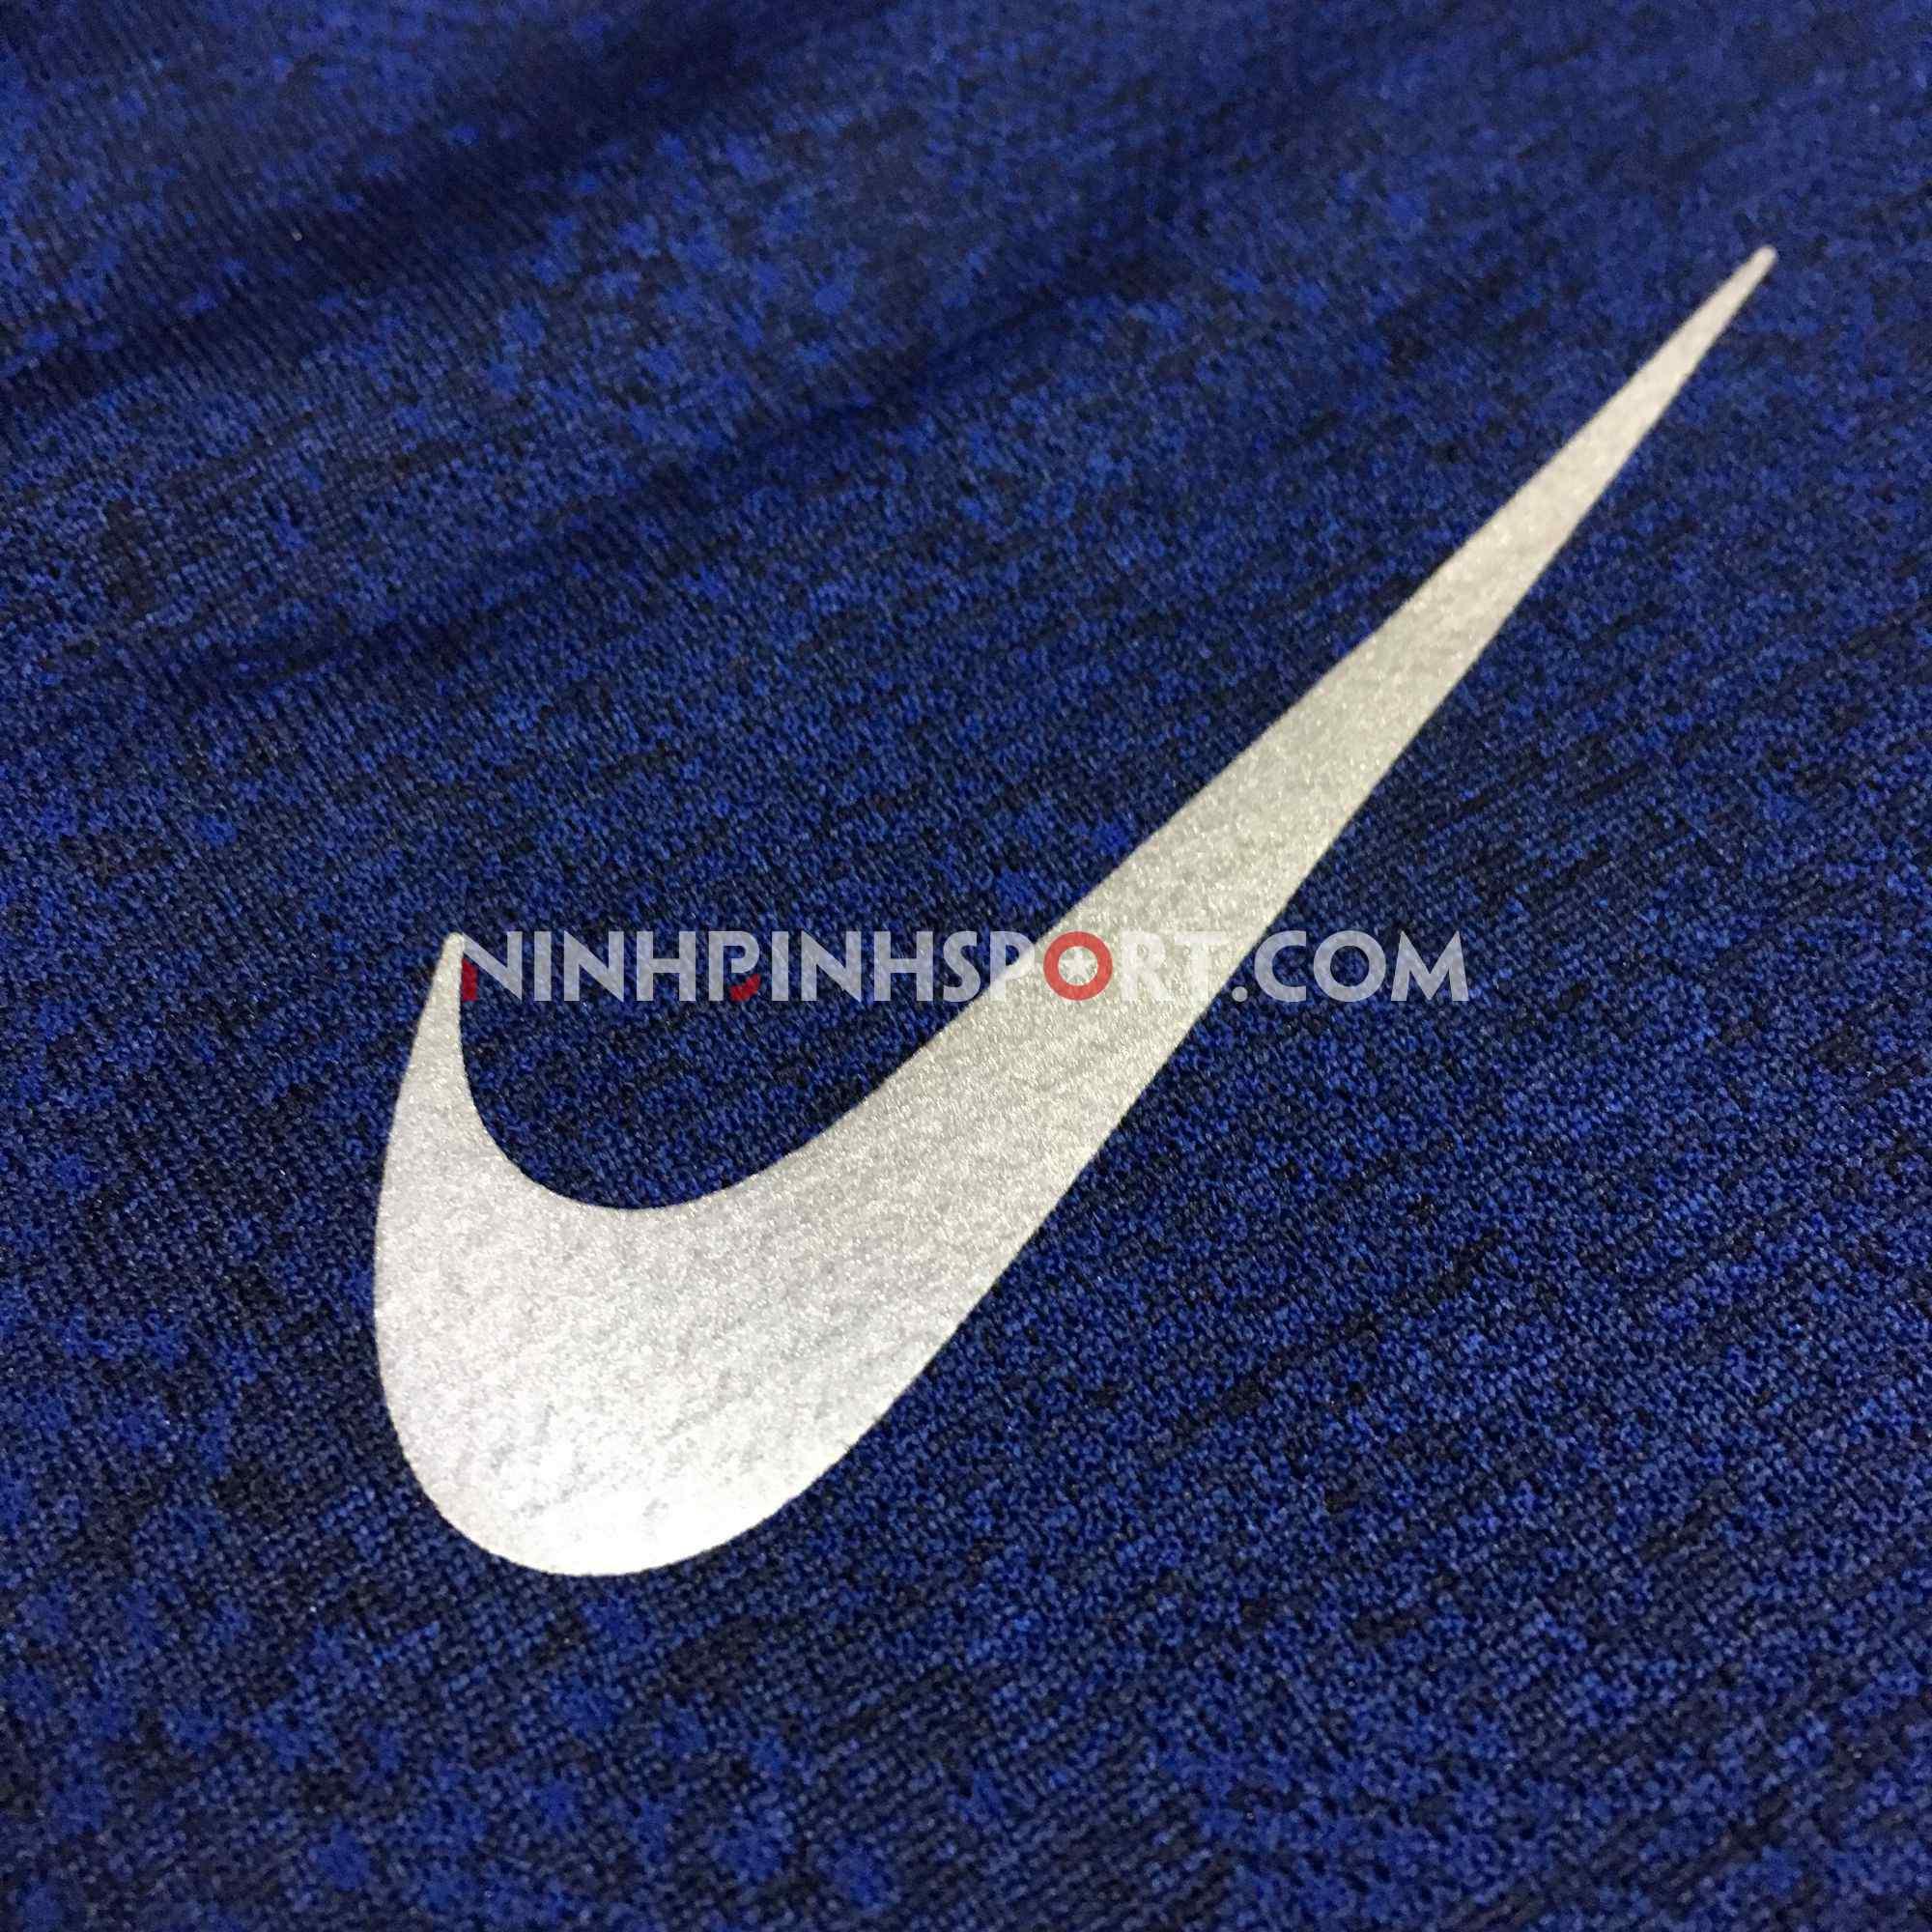 Áo thể thao nam Nike Dri Fit Miler Jacquard AJ7572-492